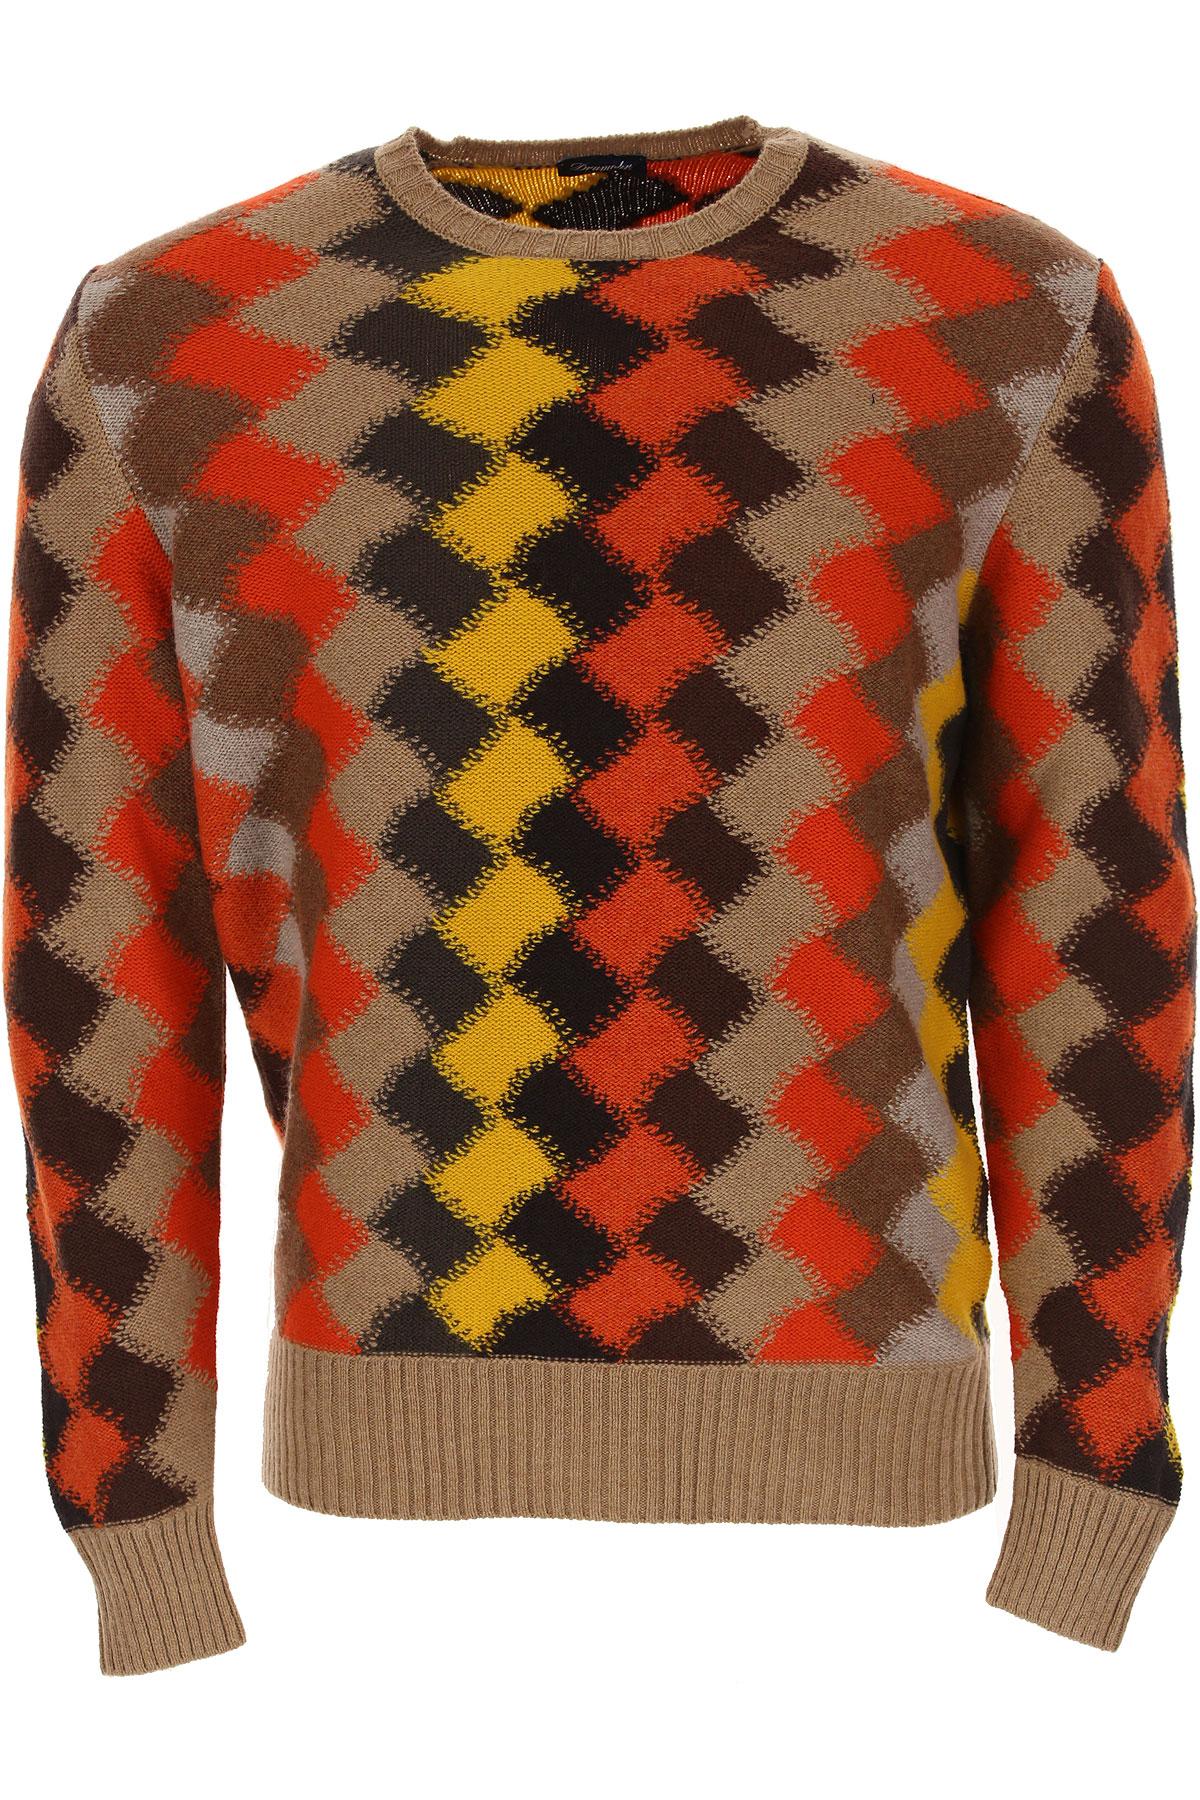 Drumohr Sweater for Men Jumper, Camel, Lambswool, 2019, M XL